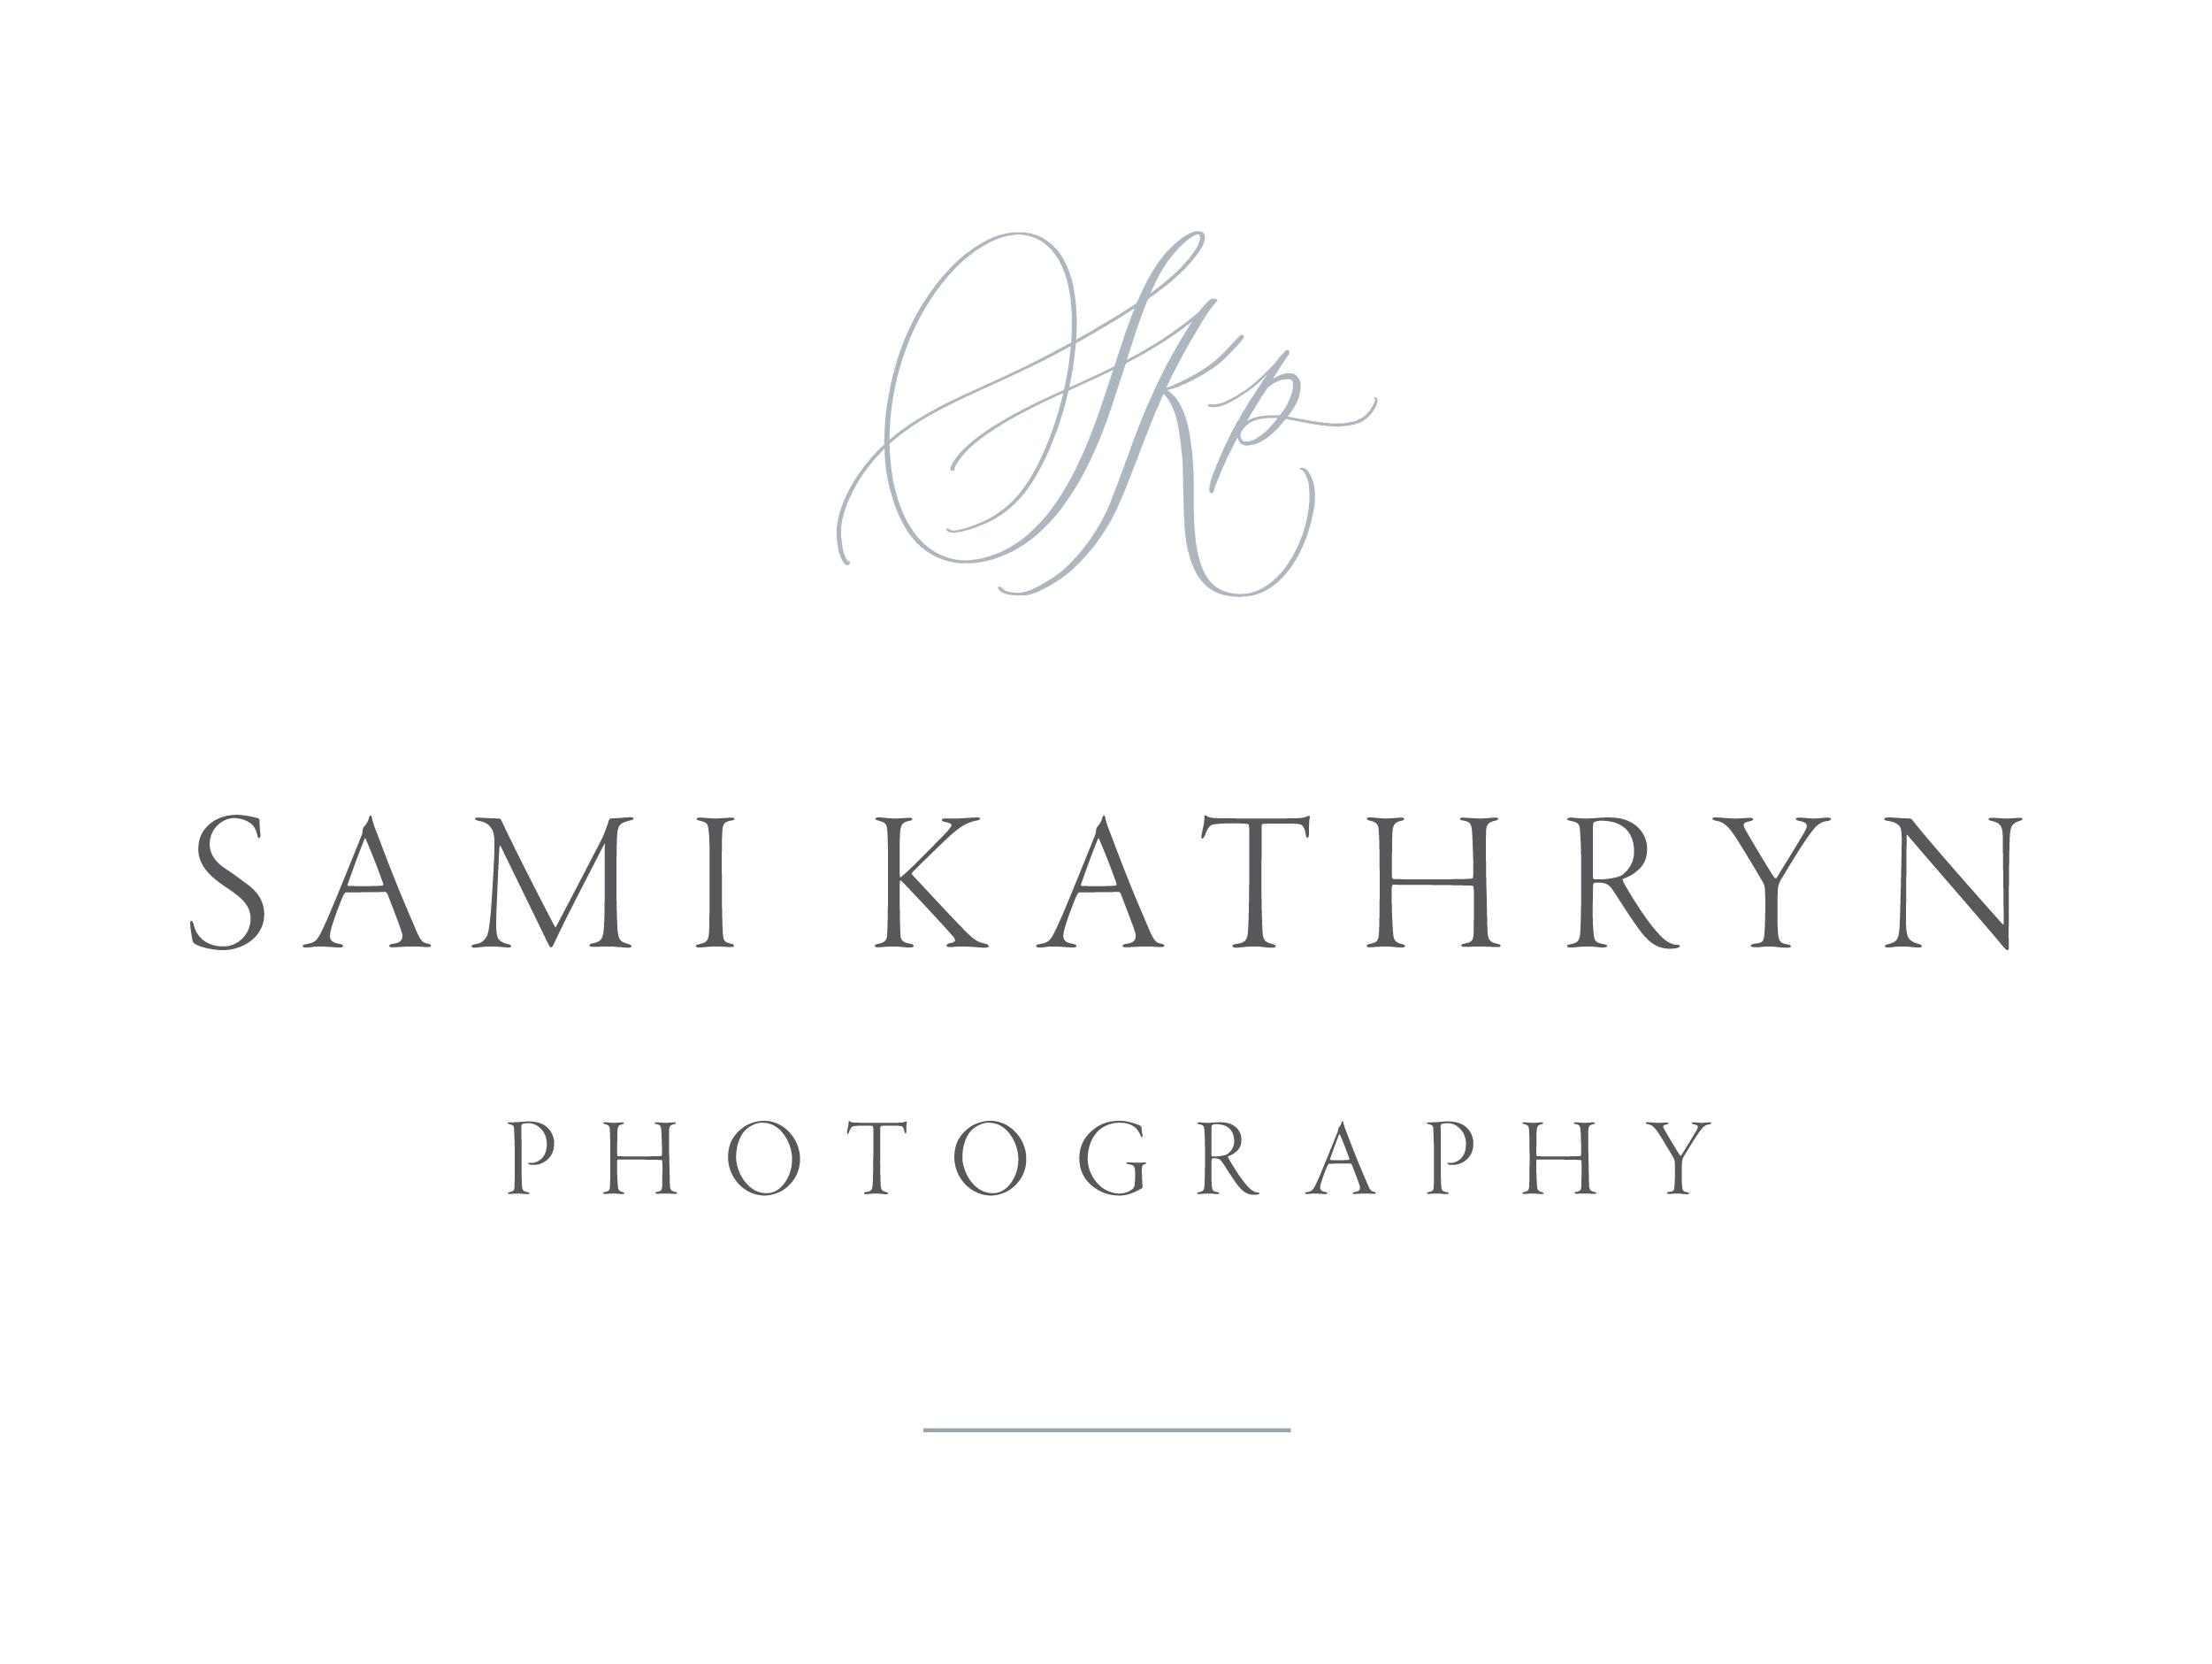 Sami Kathryn Photography Photography